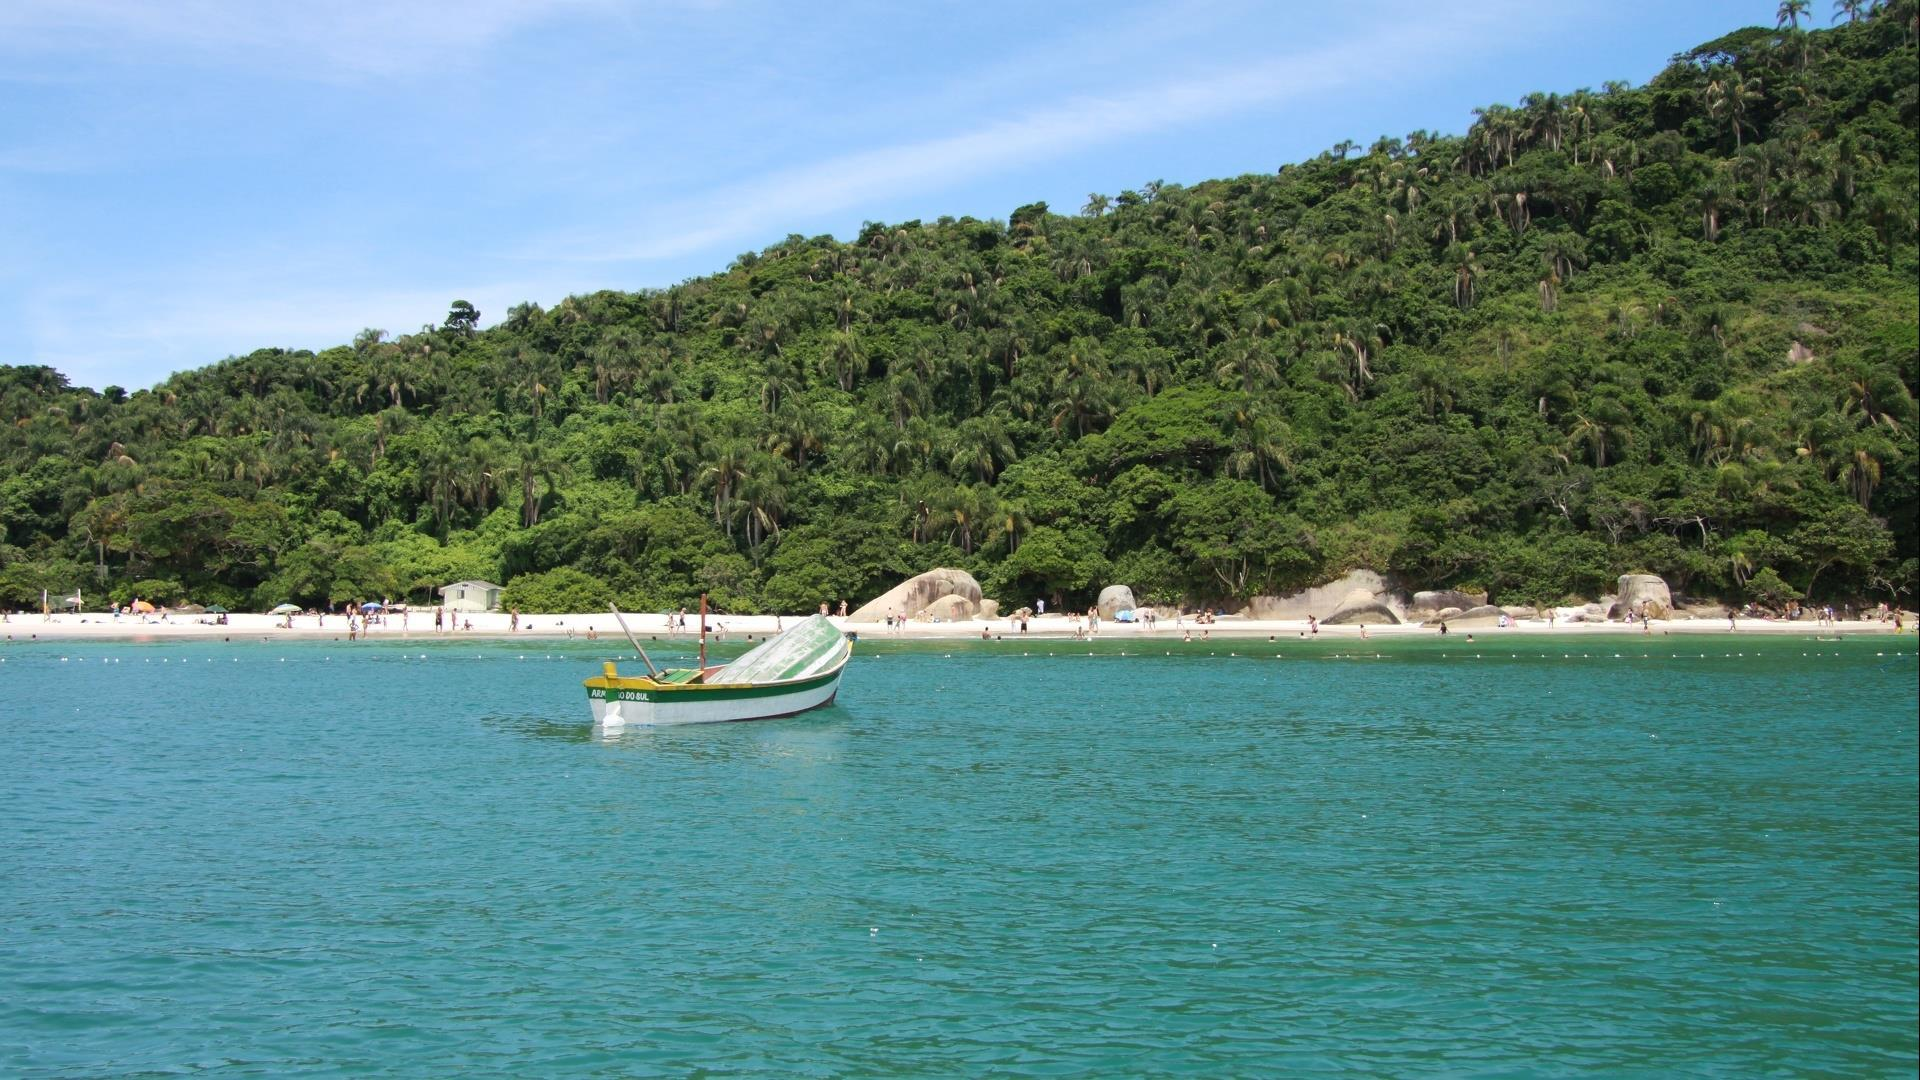 Brasilien Florianopolis: 5 Tage Reisebaustein - Florianopolis aktiv erleben